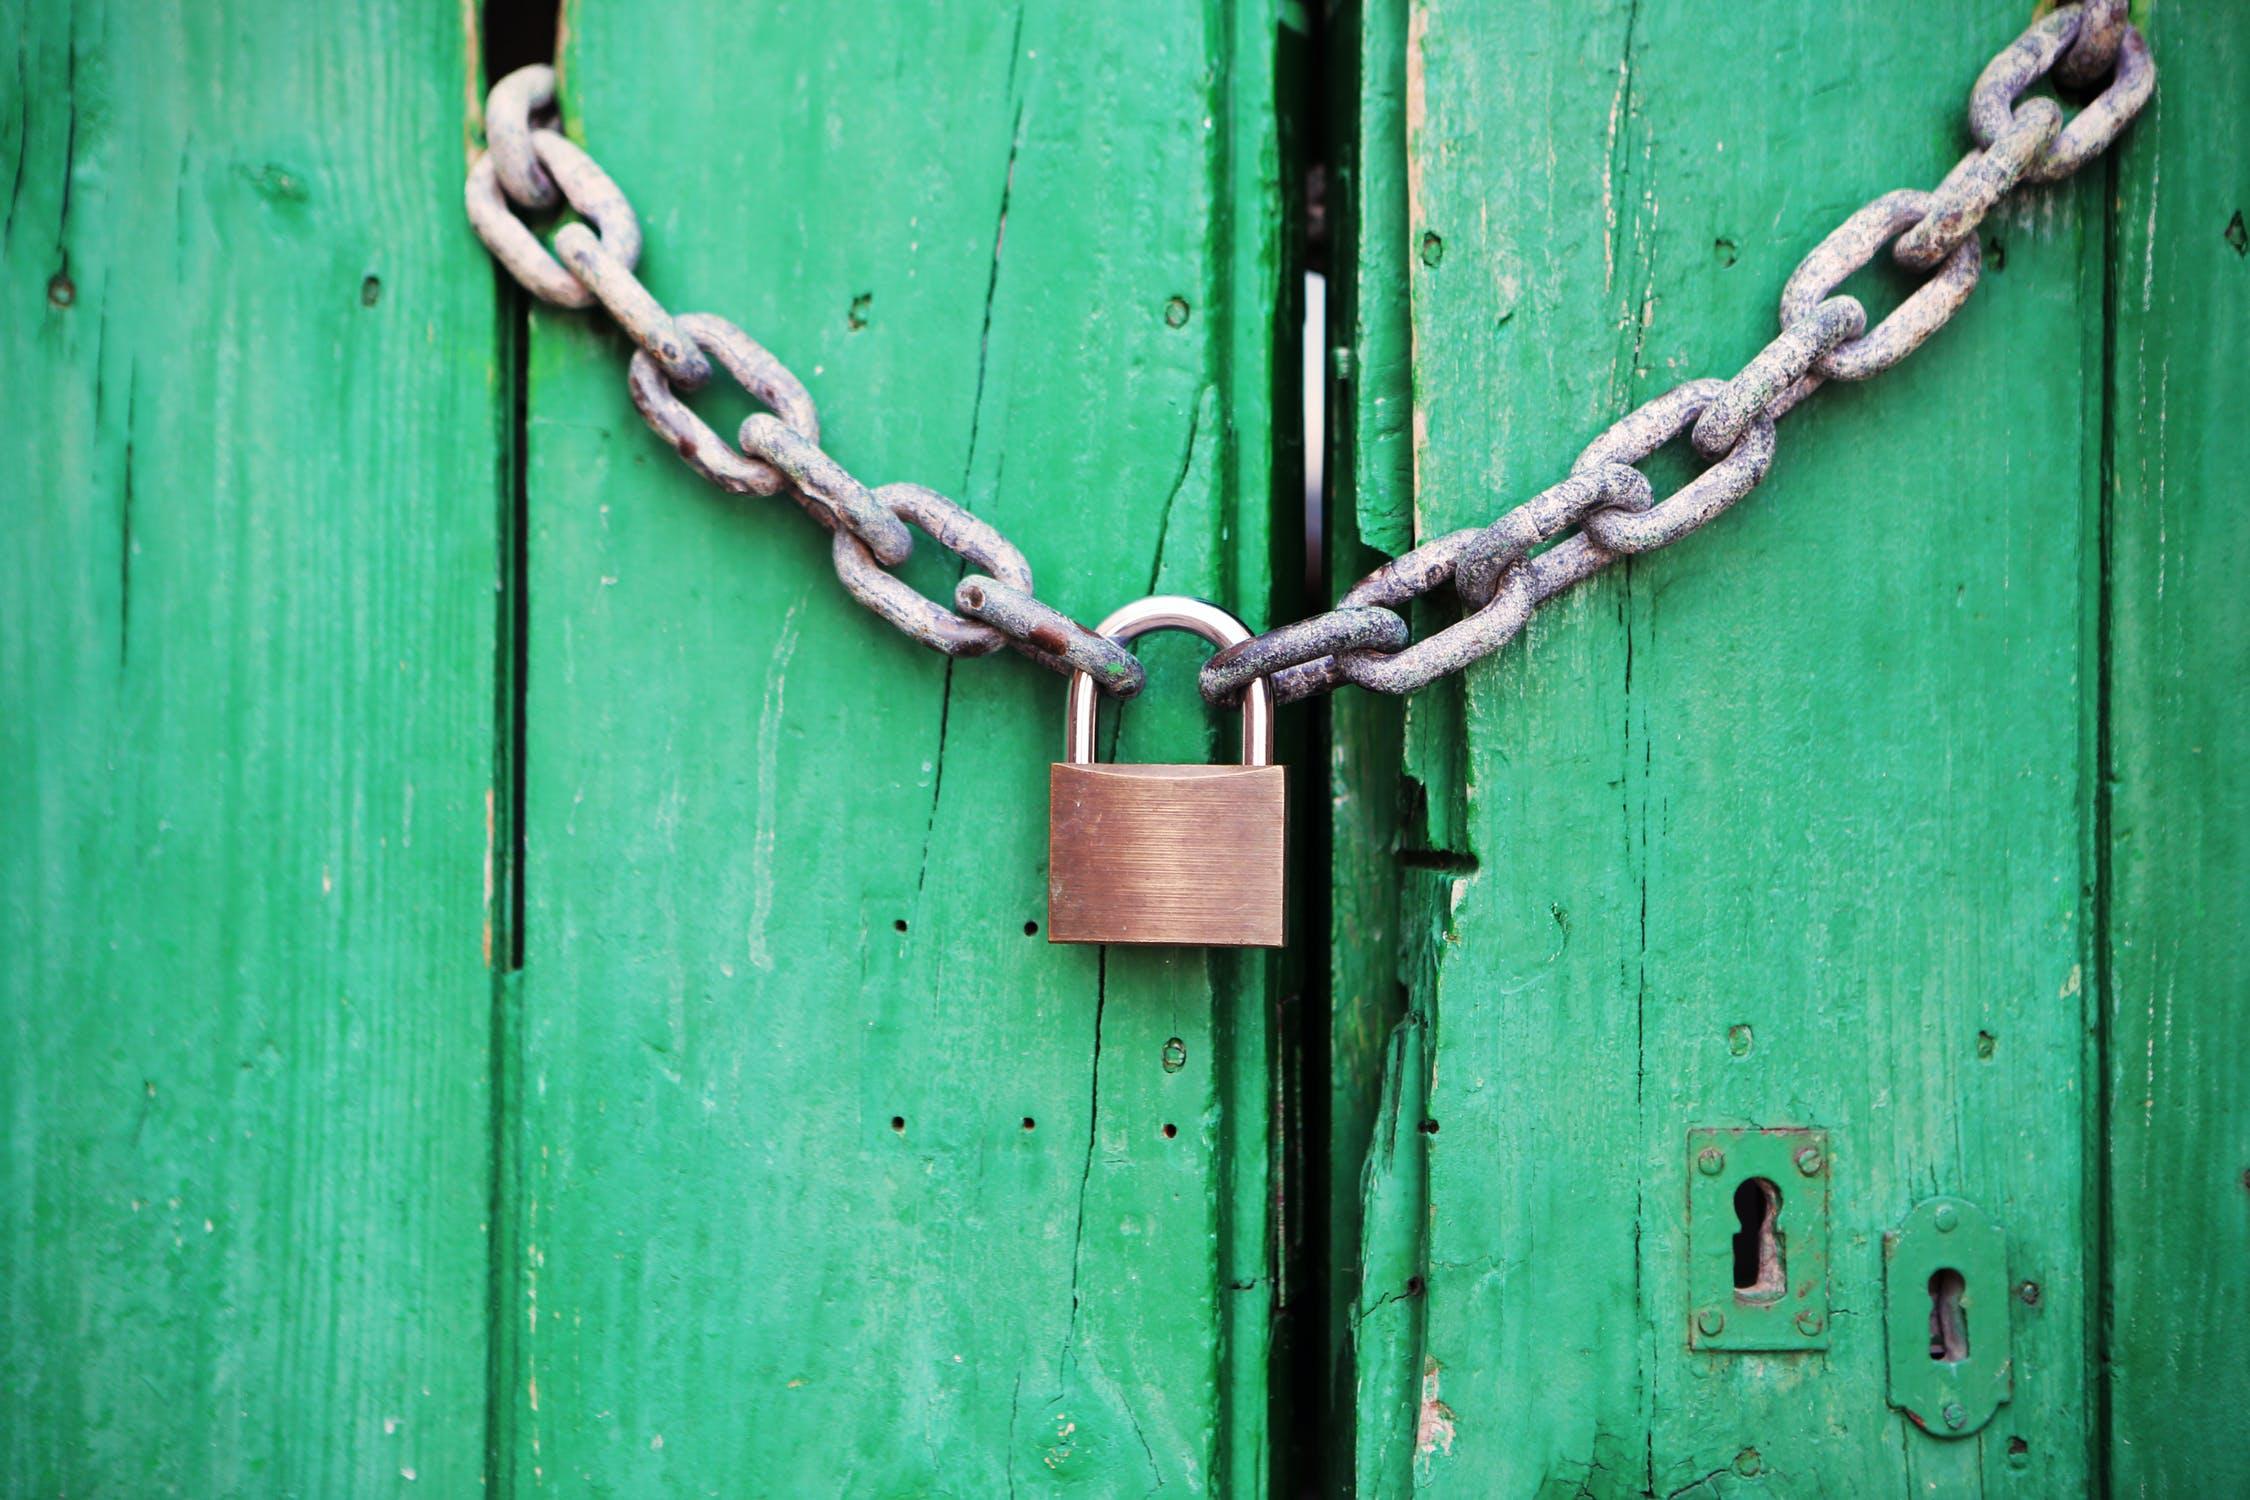 http://serwer1604278.home.pl/przedsiebiorca.eurekarestrukturyzacje.pl/wp-content/uploads/2020/07/door-green-closed-lock.jpg